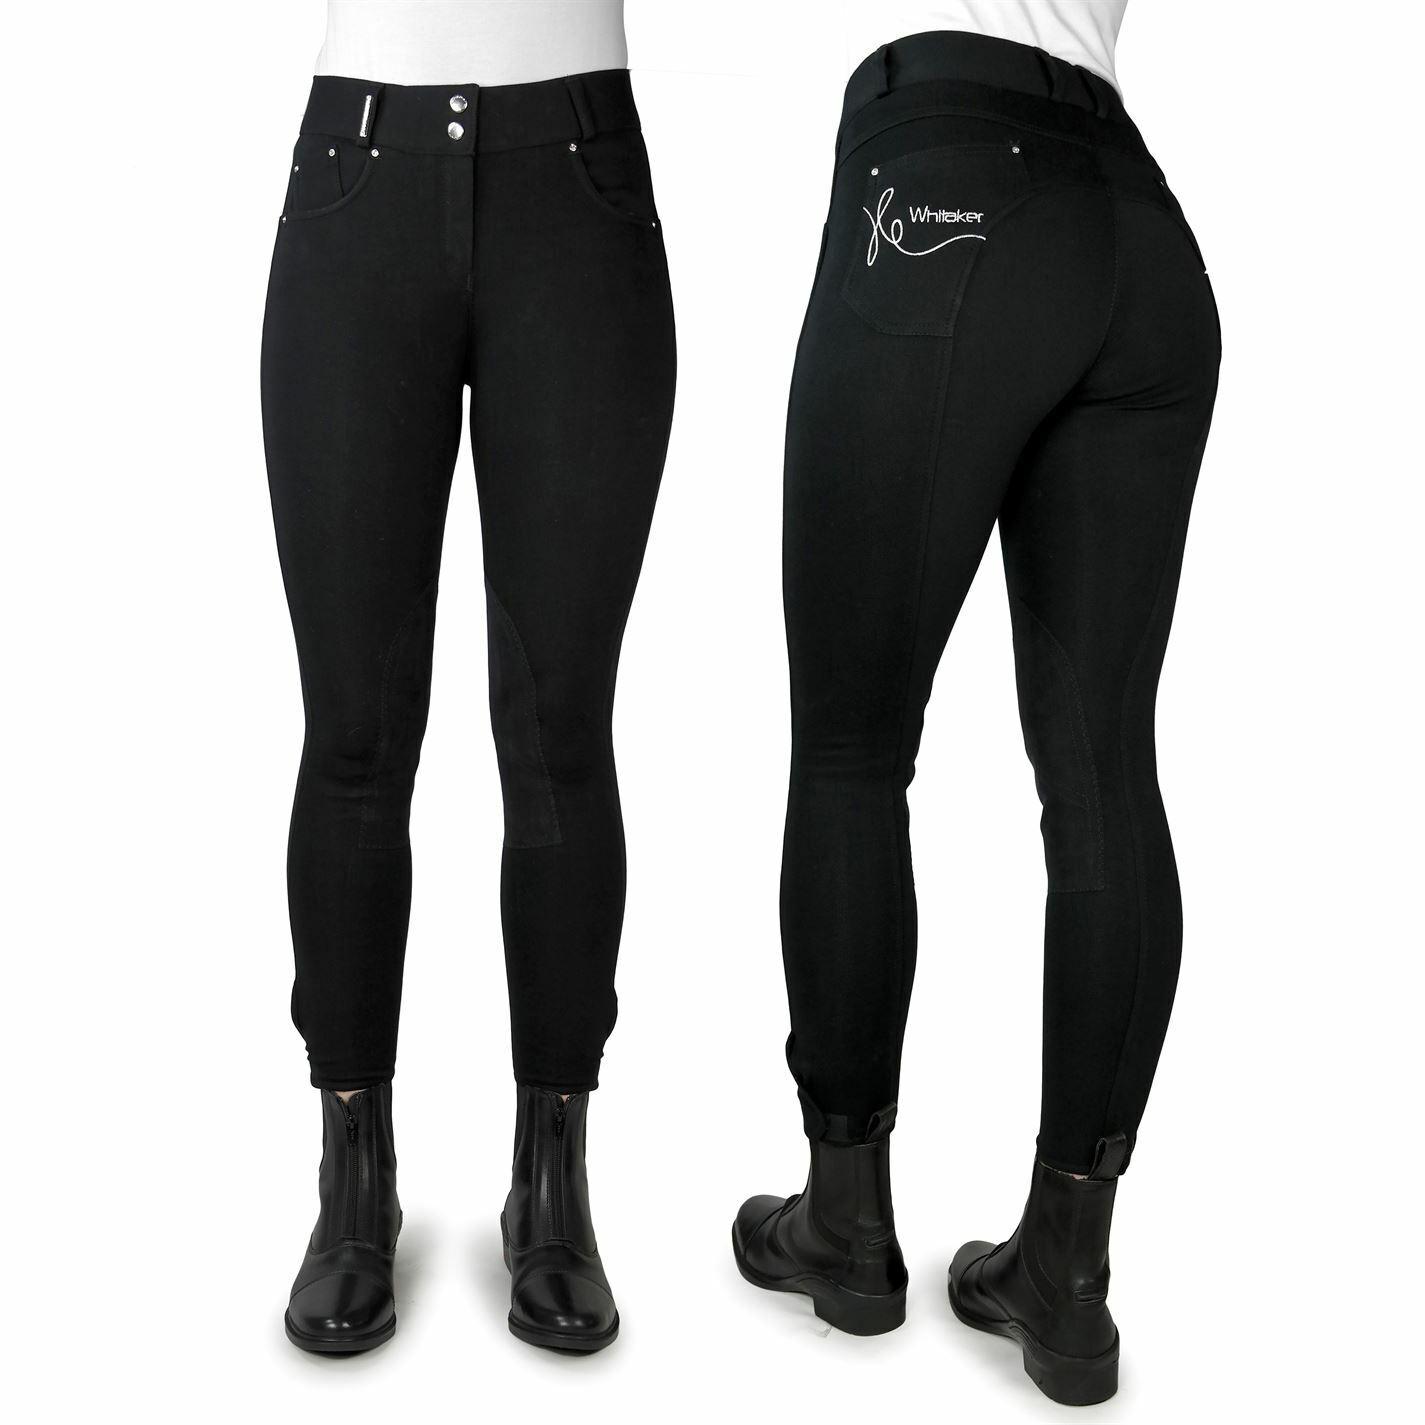 John Whitaker Womens Ladies Sutton Breeches Competition Jodhpurs Pants Trousers